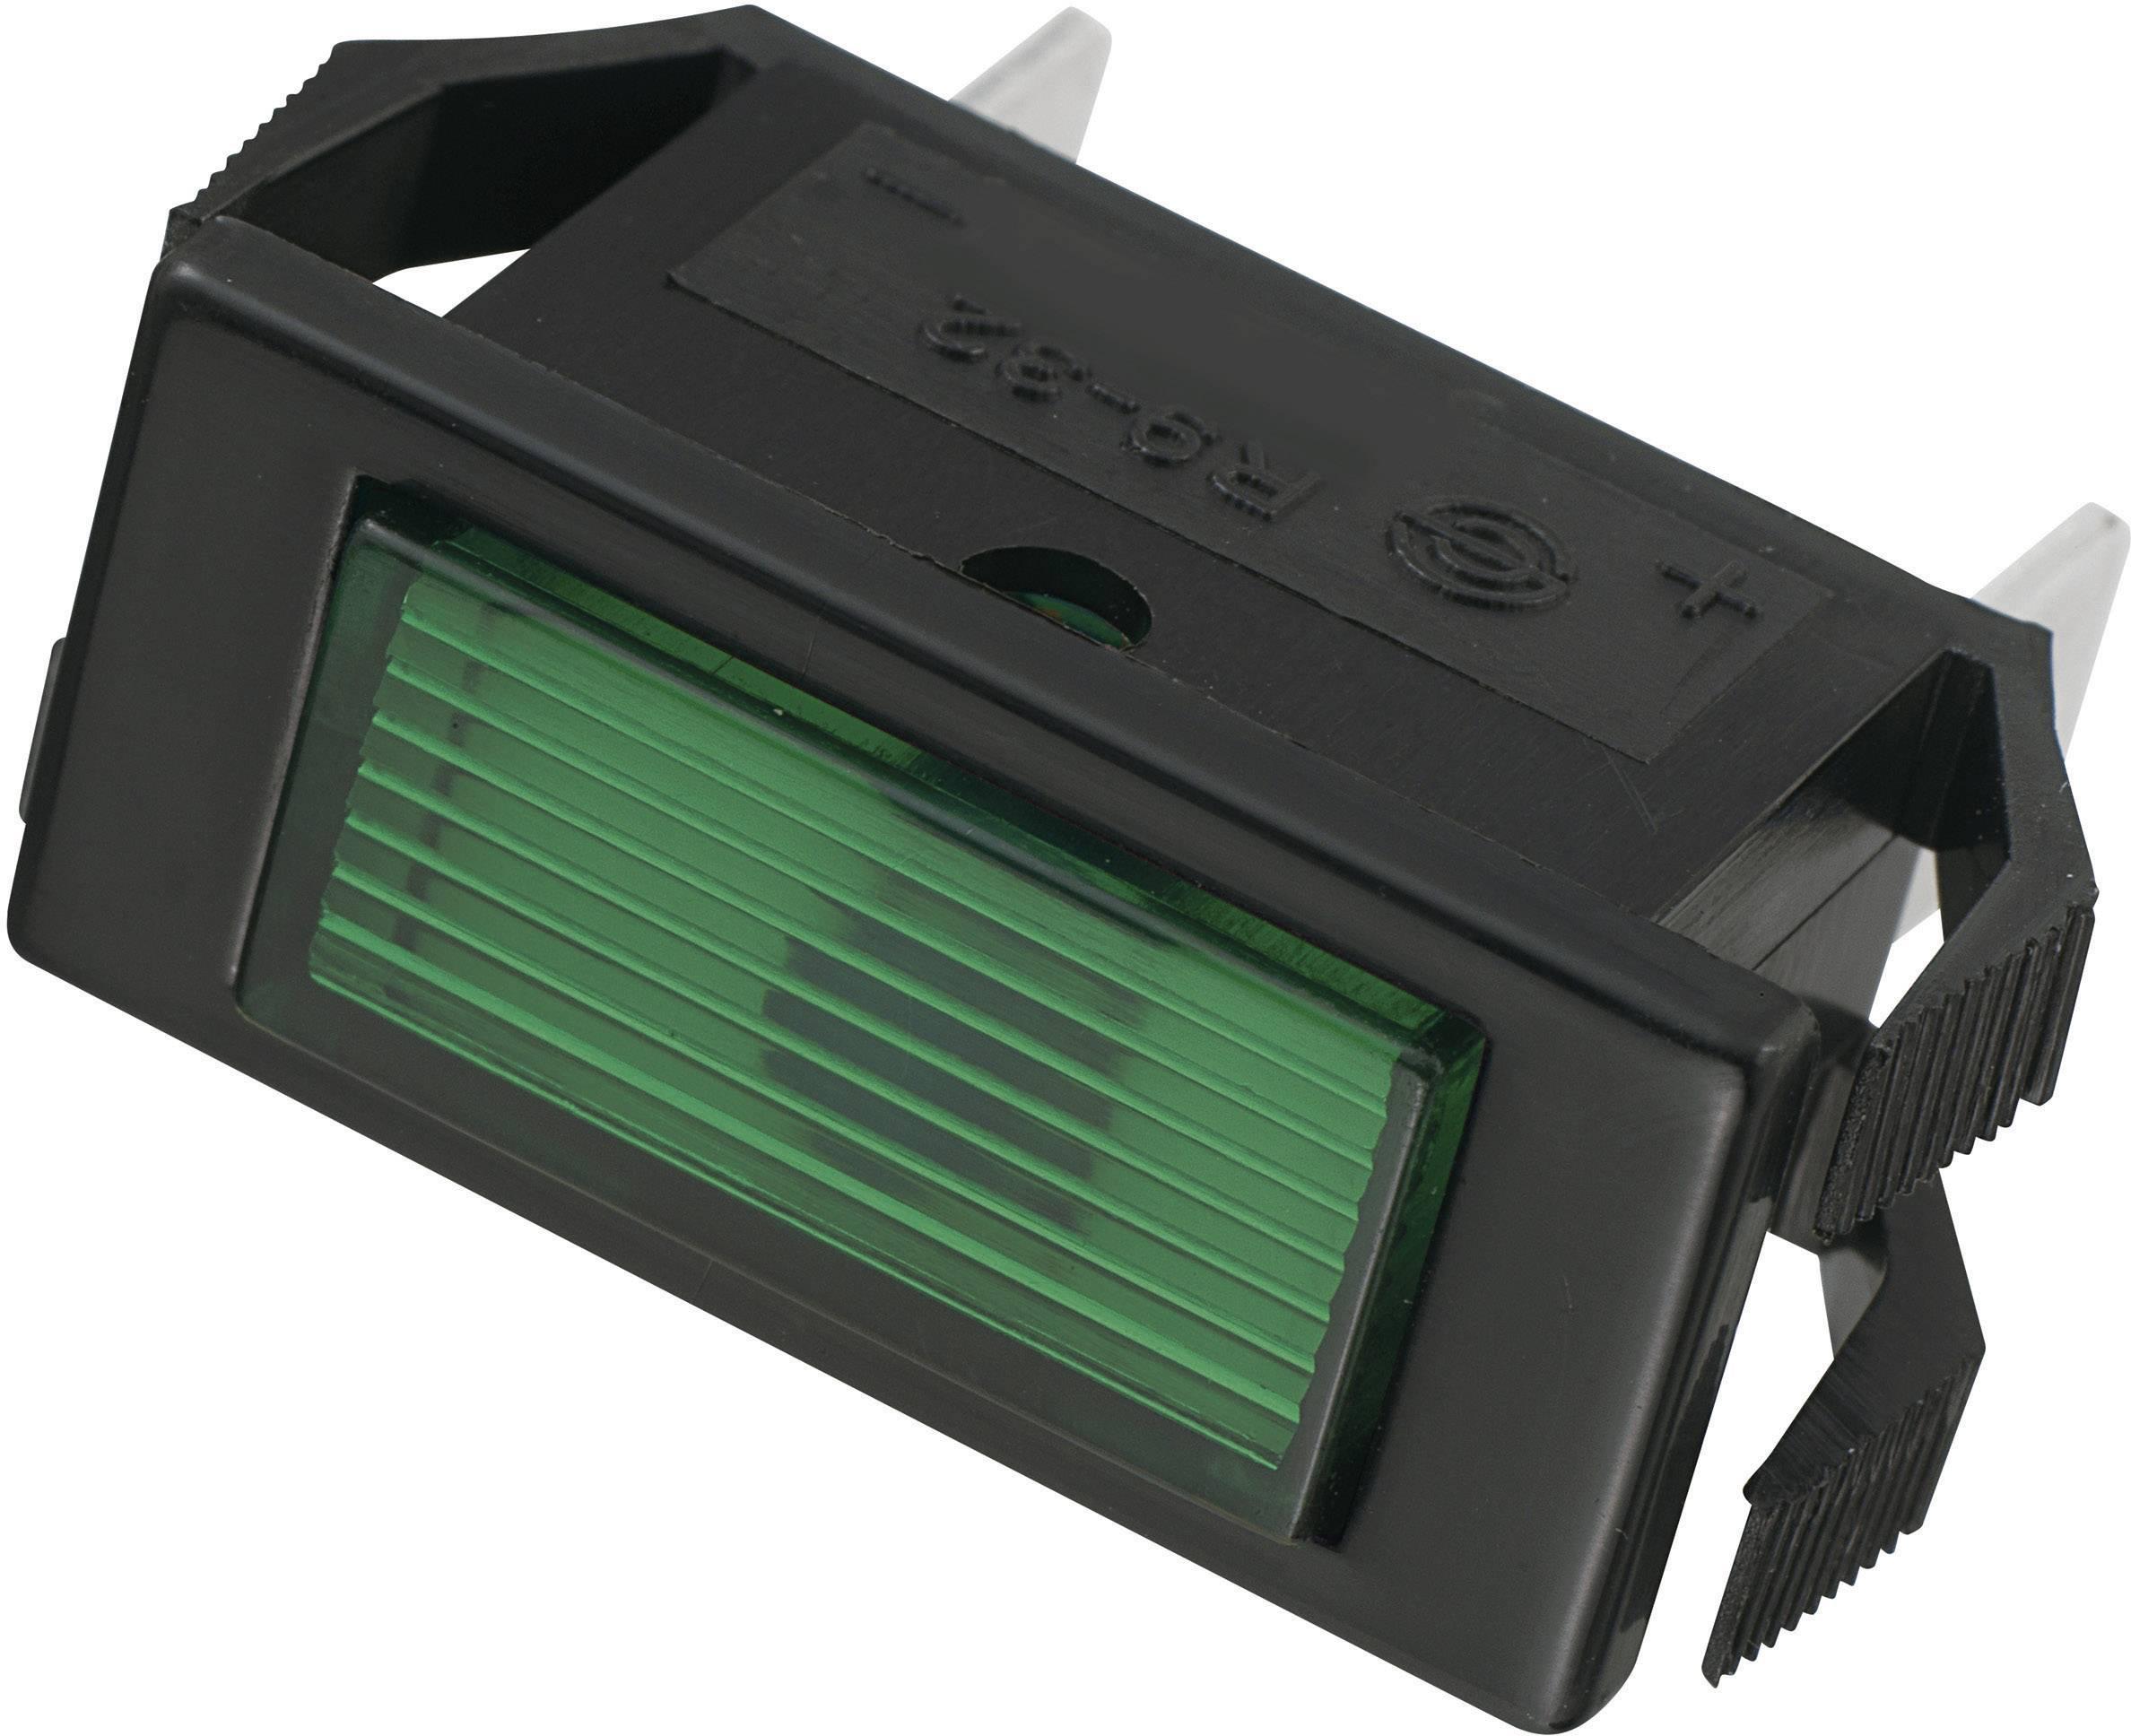 SCI R9-32B 28430c986, zelená, 1 ks